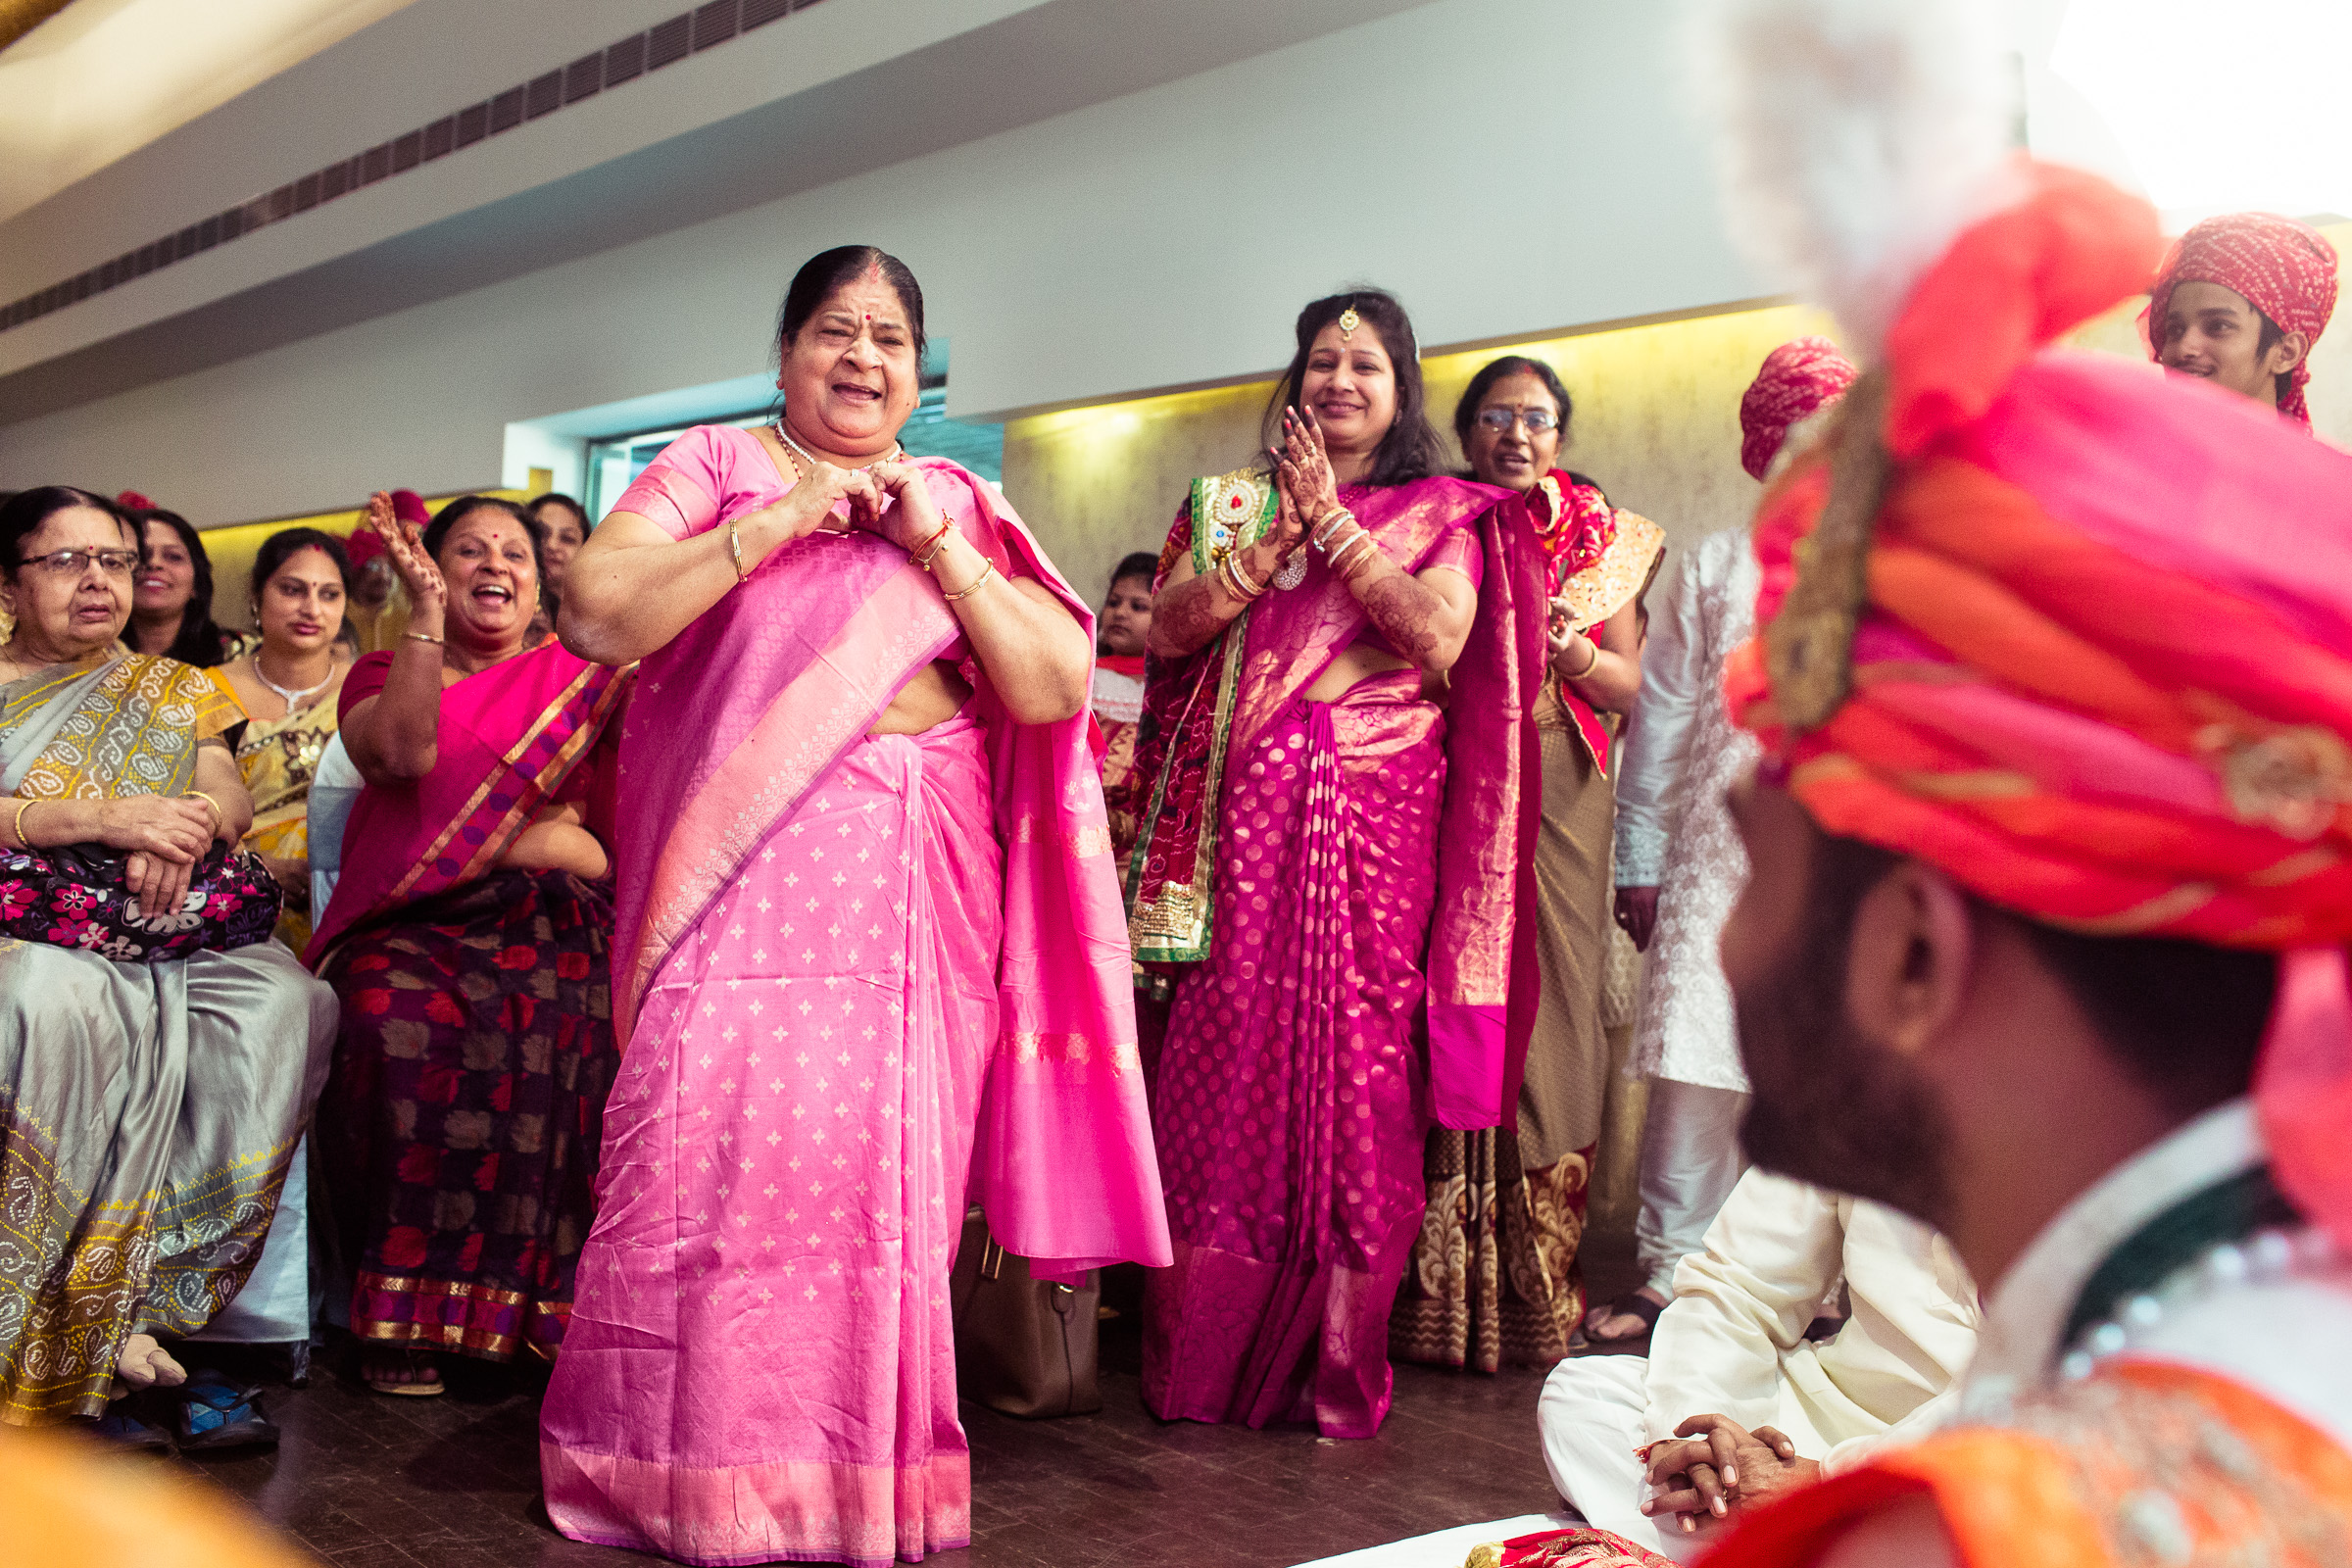 marwari-candid-wedding-photographers-bangalore-0012.jpg